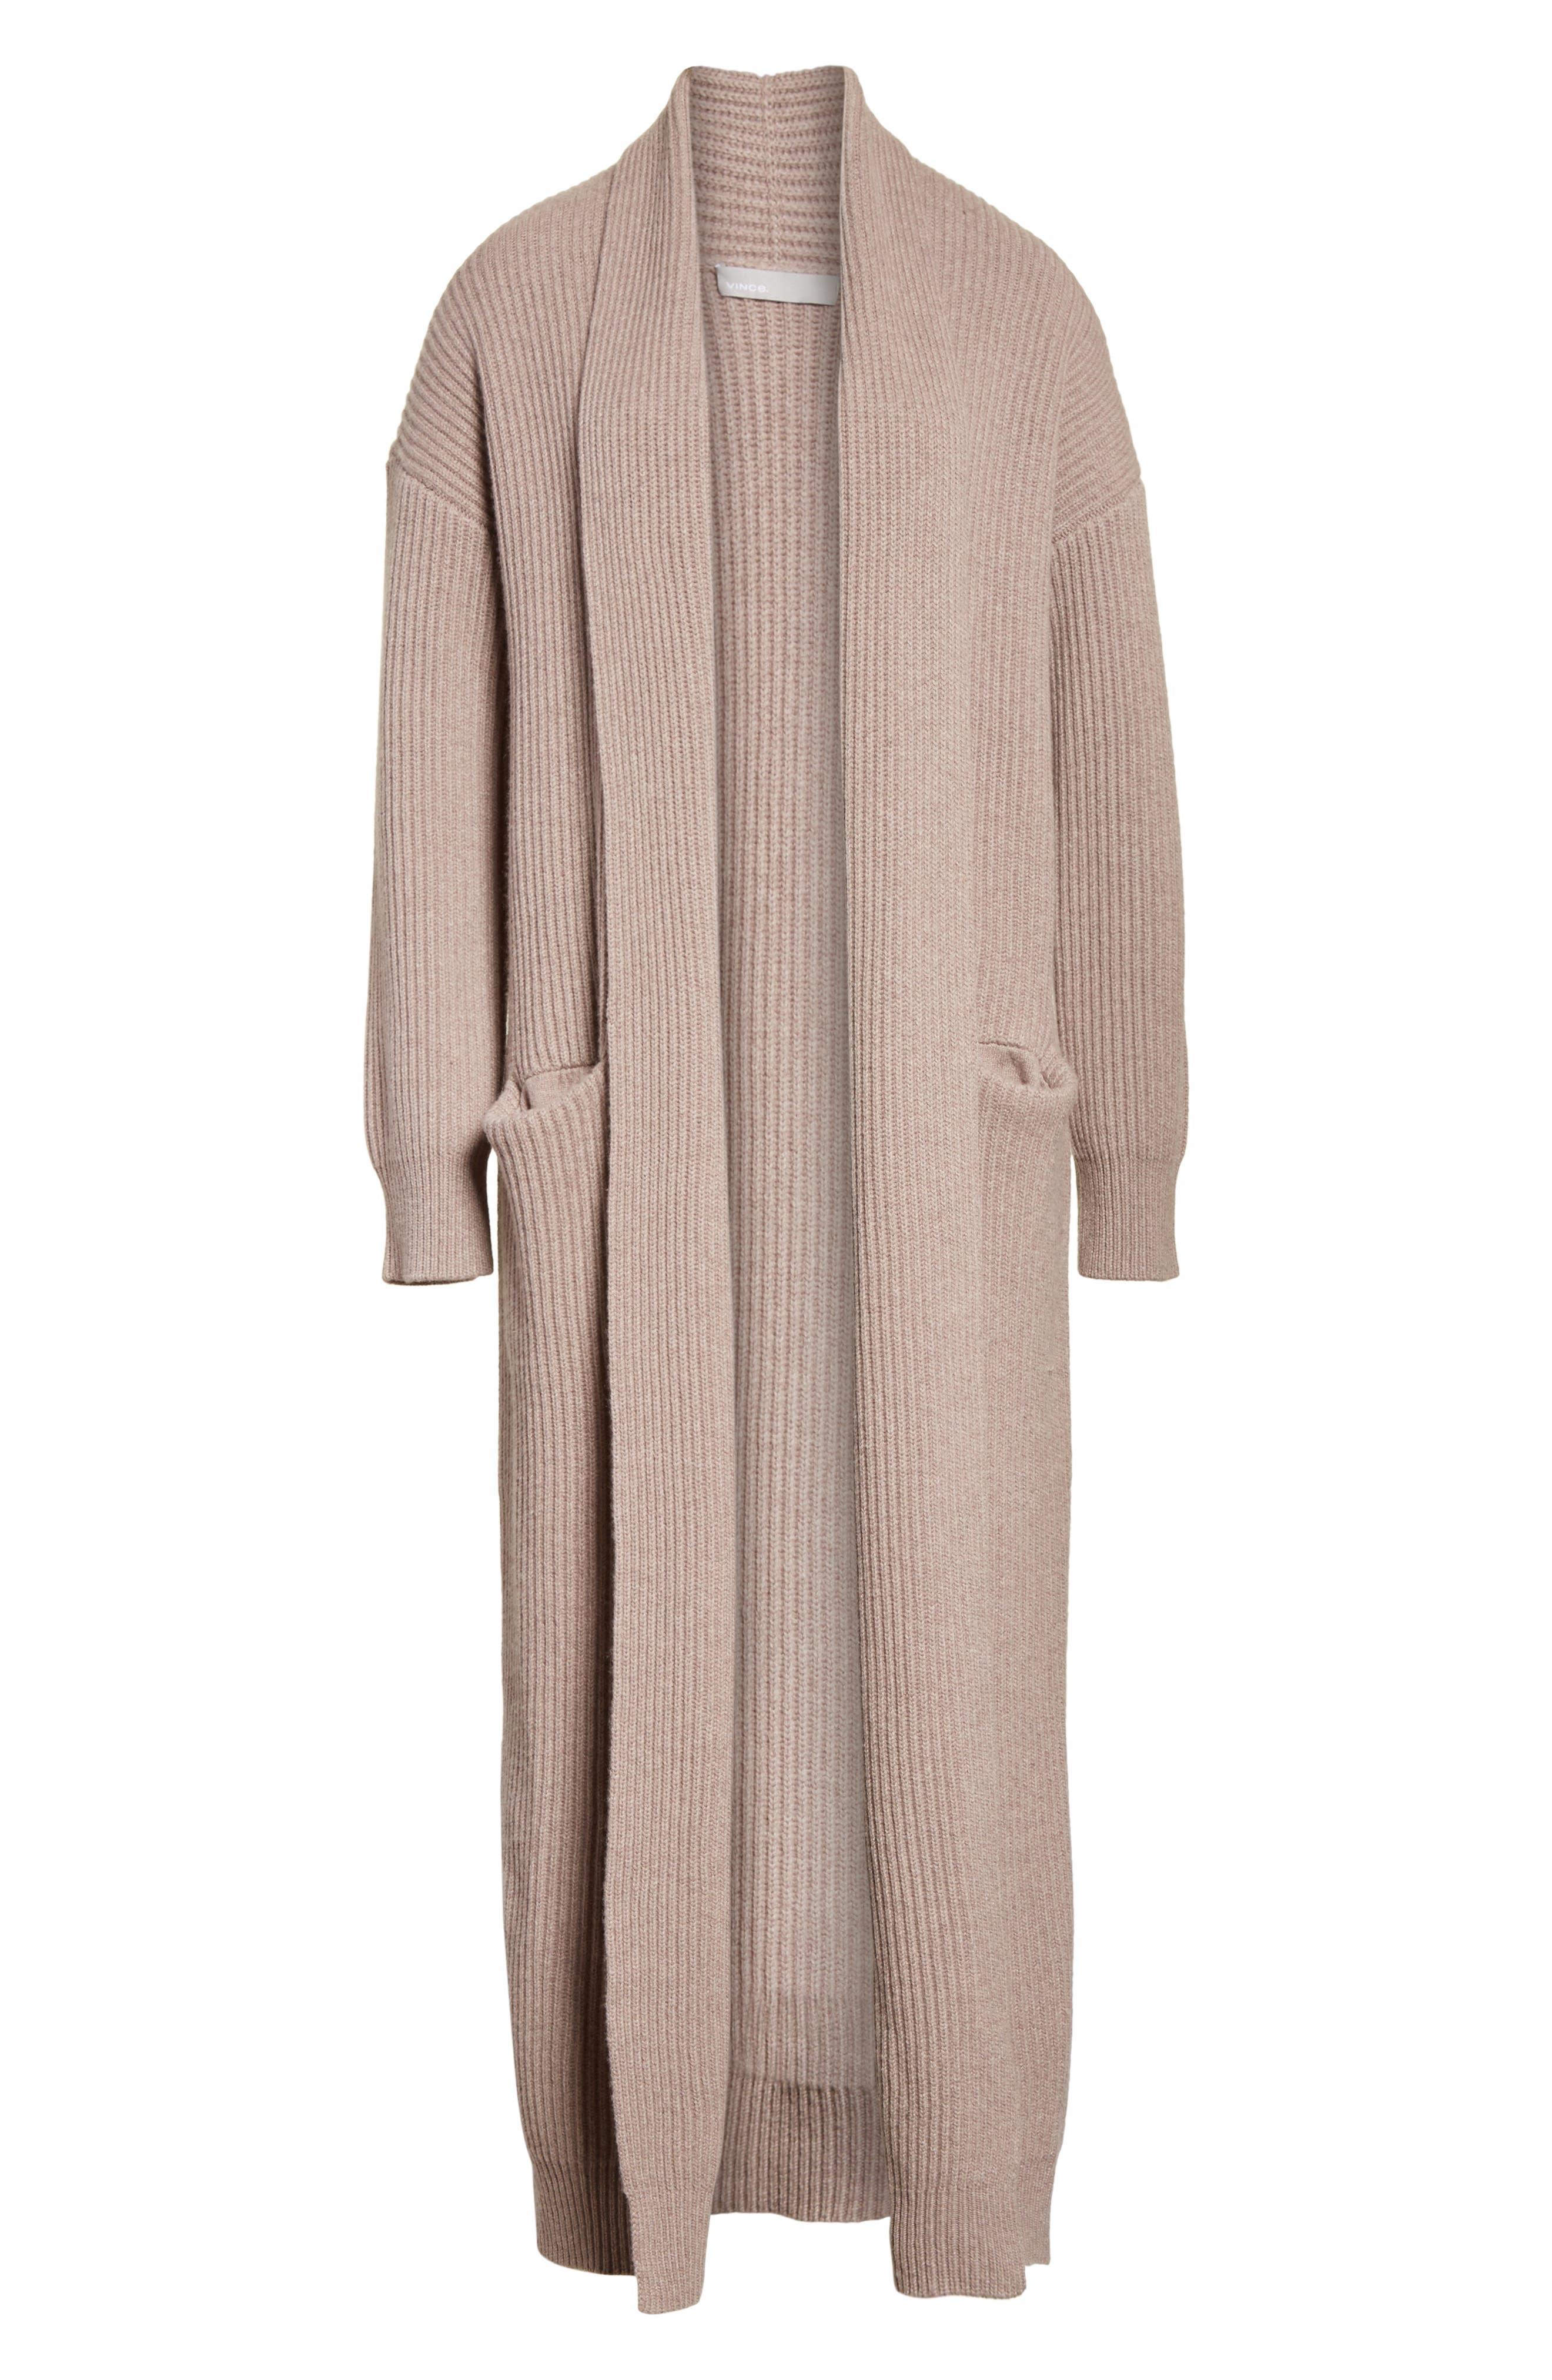 VINCE,                             Long Knit Sweater Robe,                             Alternate thumbnail 6, color,                             260